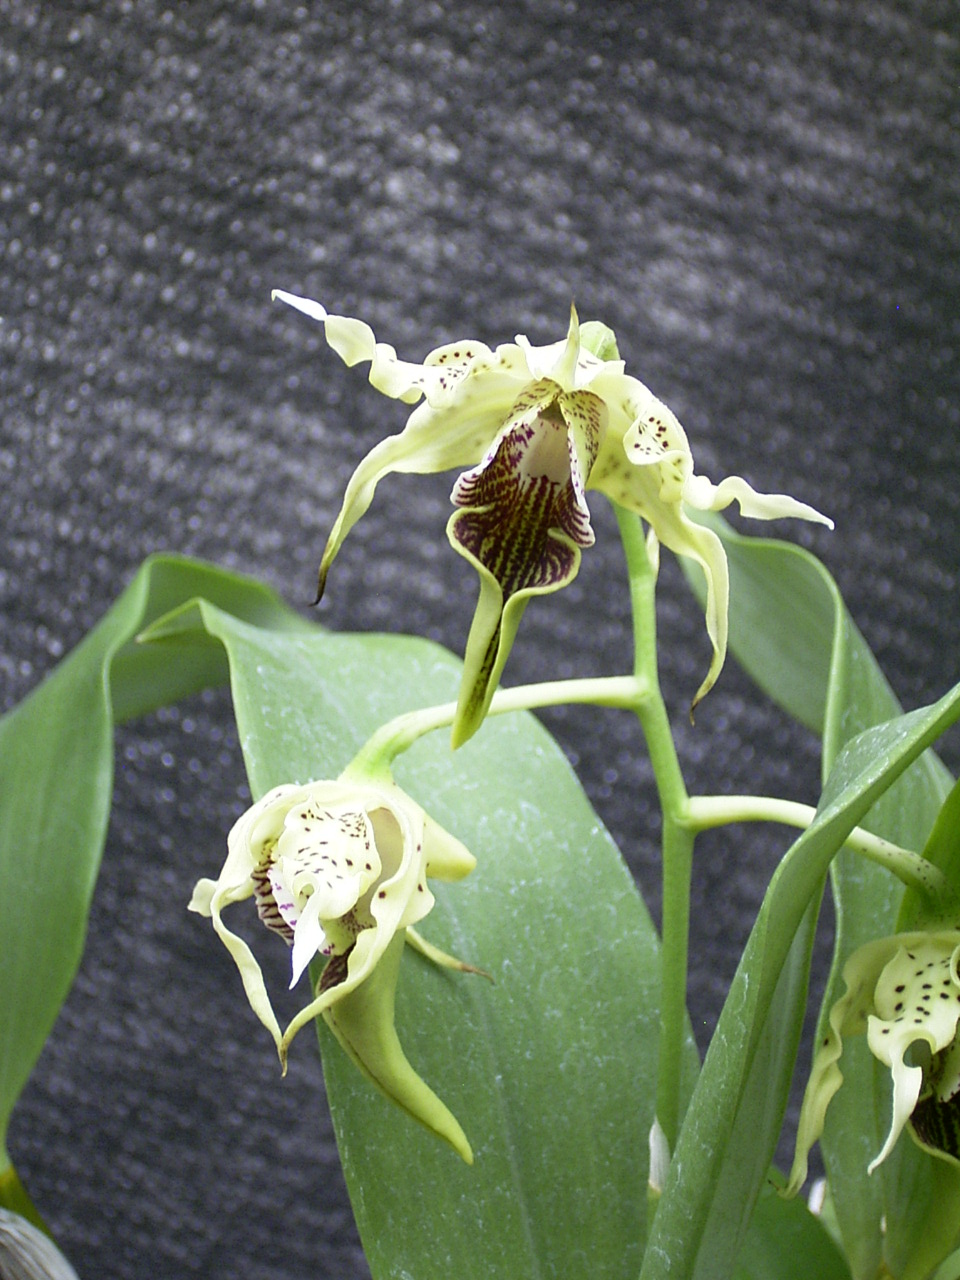 http://orchids.la.coocan.jp/Dendrobium/Dendrobium%20alexandrae/R0043347.JPG